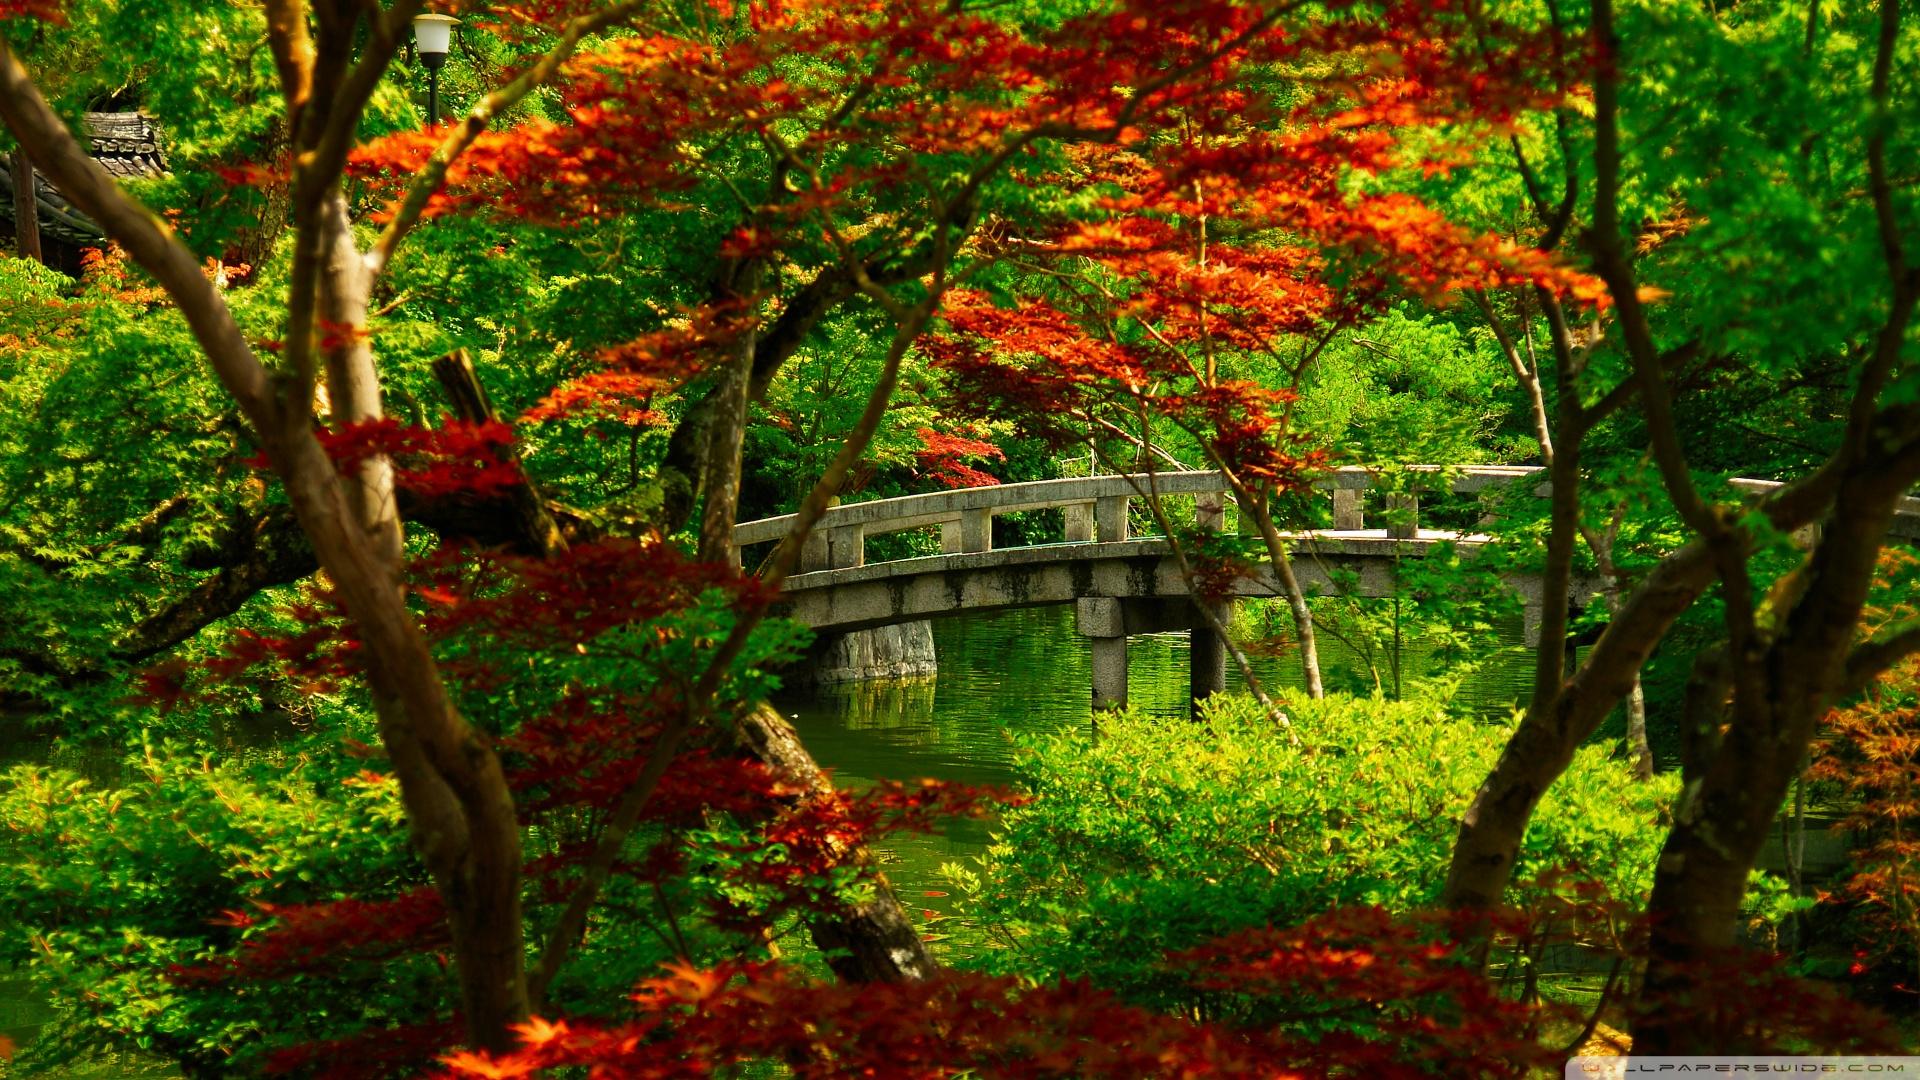 Download Japanese Garden Kyoto Wallpaper 1920x1080 1920x1080